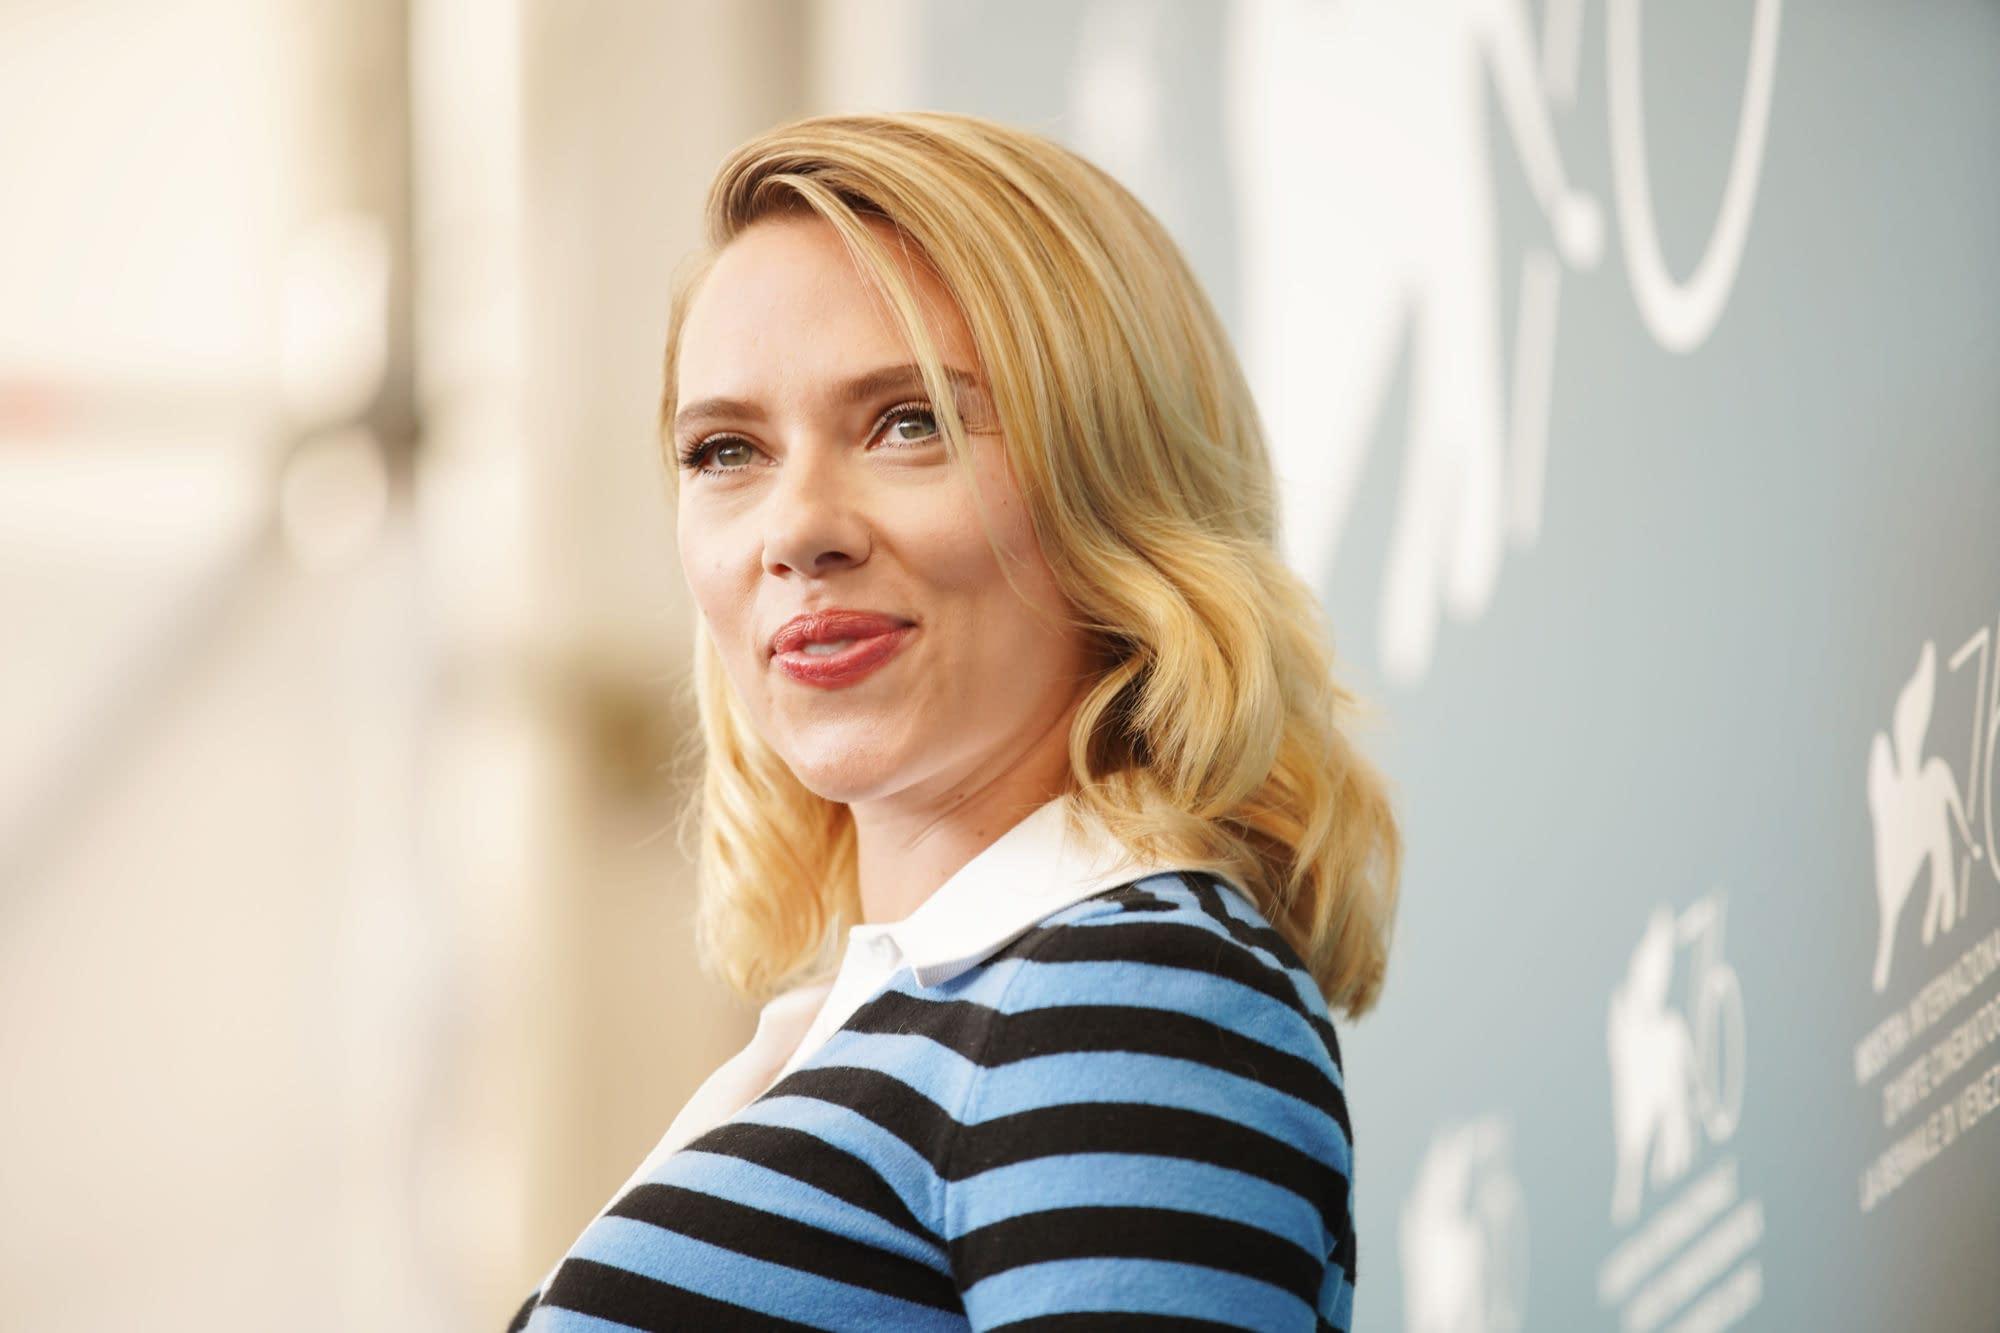 Scarlett Johansson Opens Up On Rub and Tug Backlash